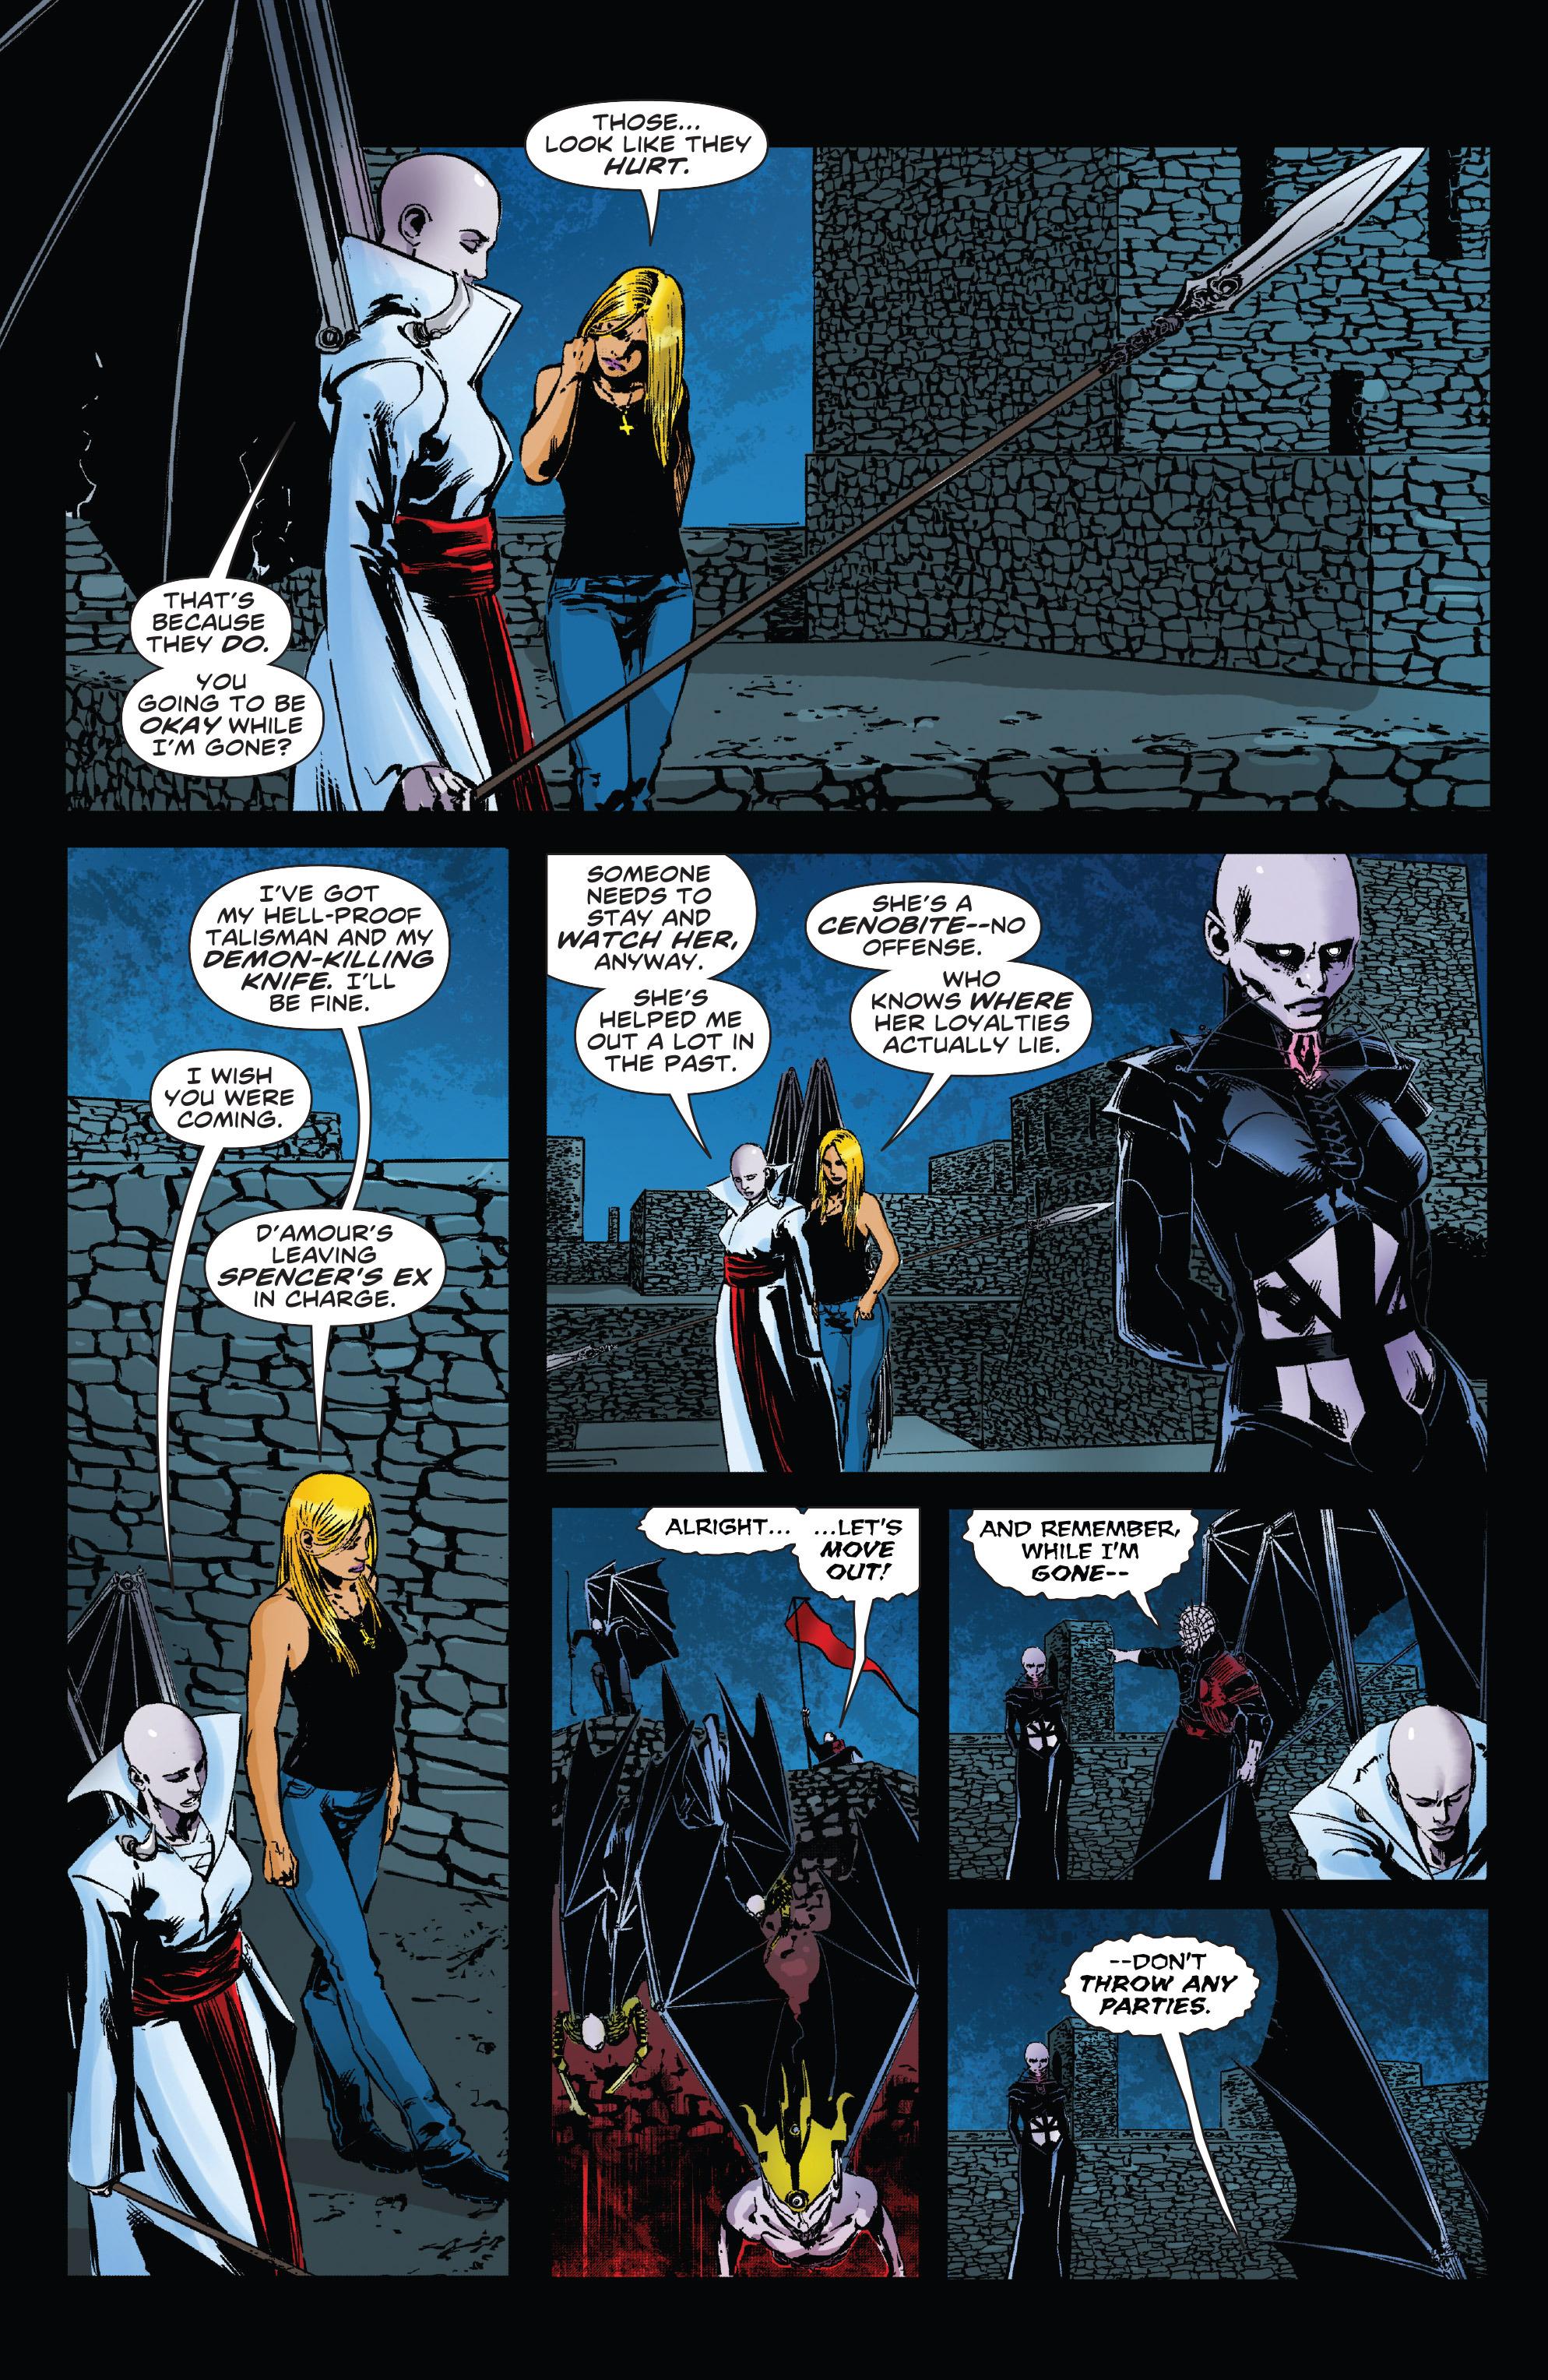 Read online Clive Barker's Hellraiser: The Dark Watch comic -  Issue # TPB 3 - 64